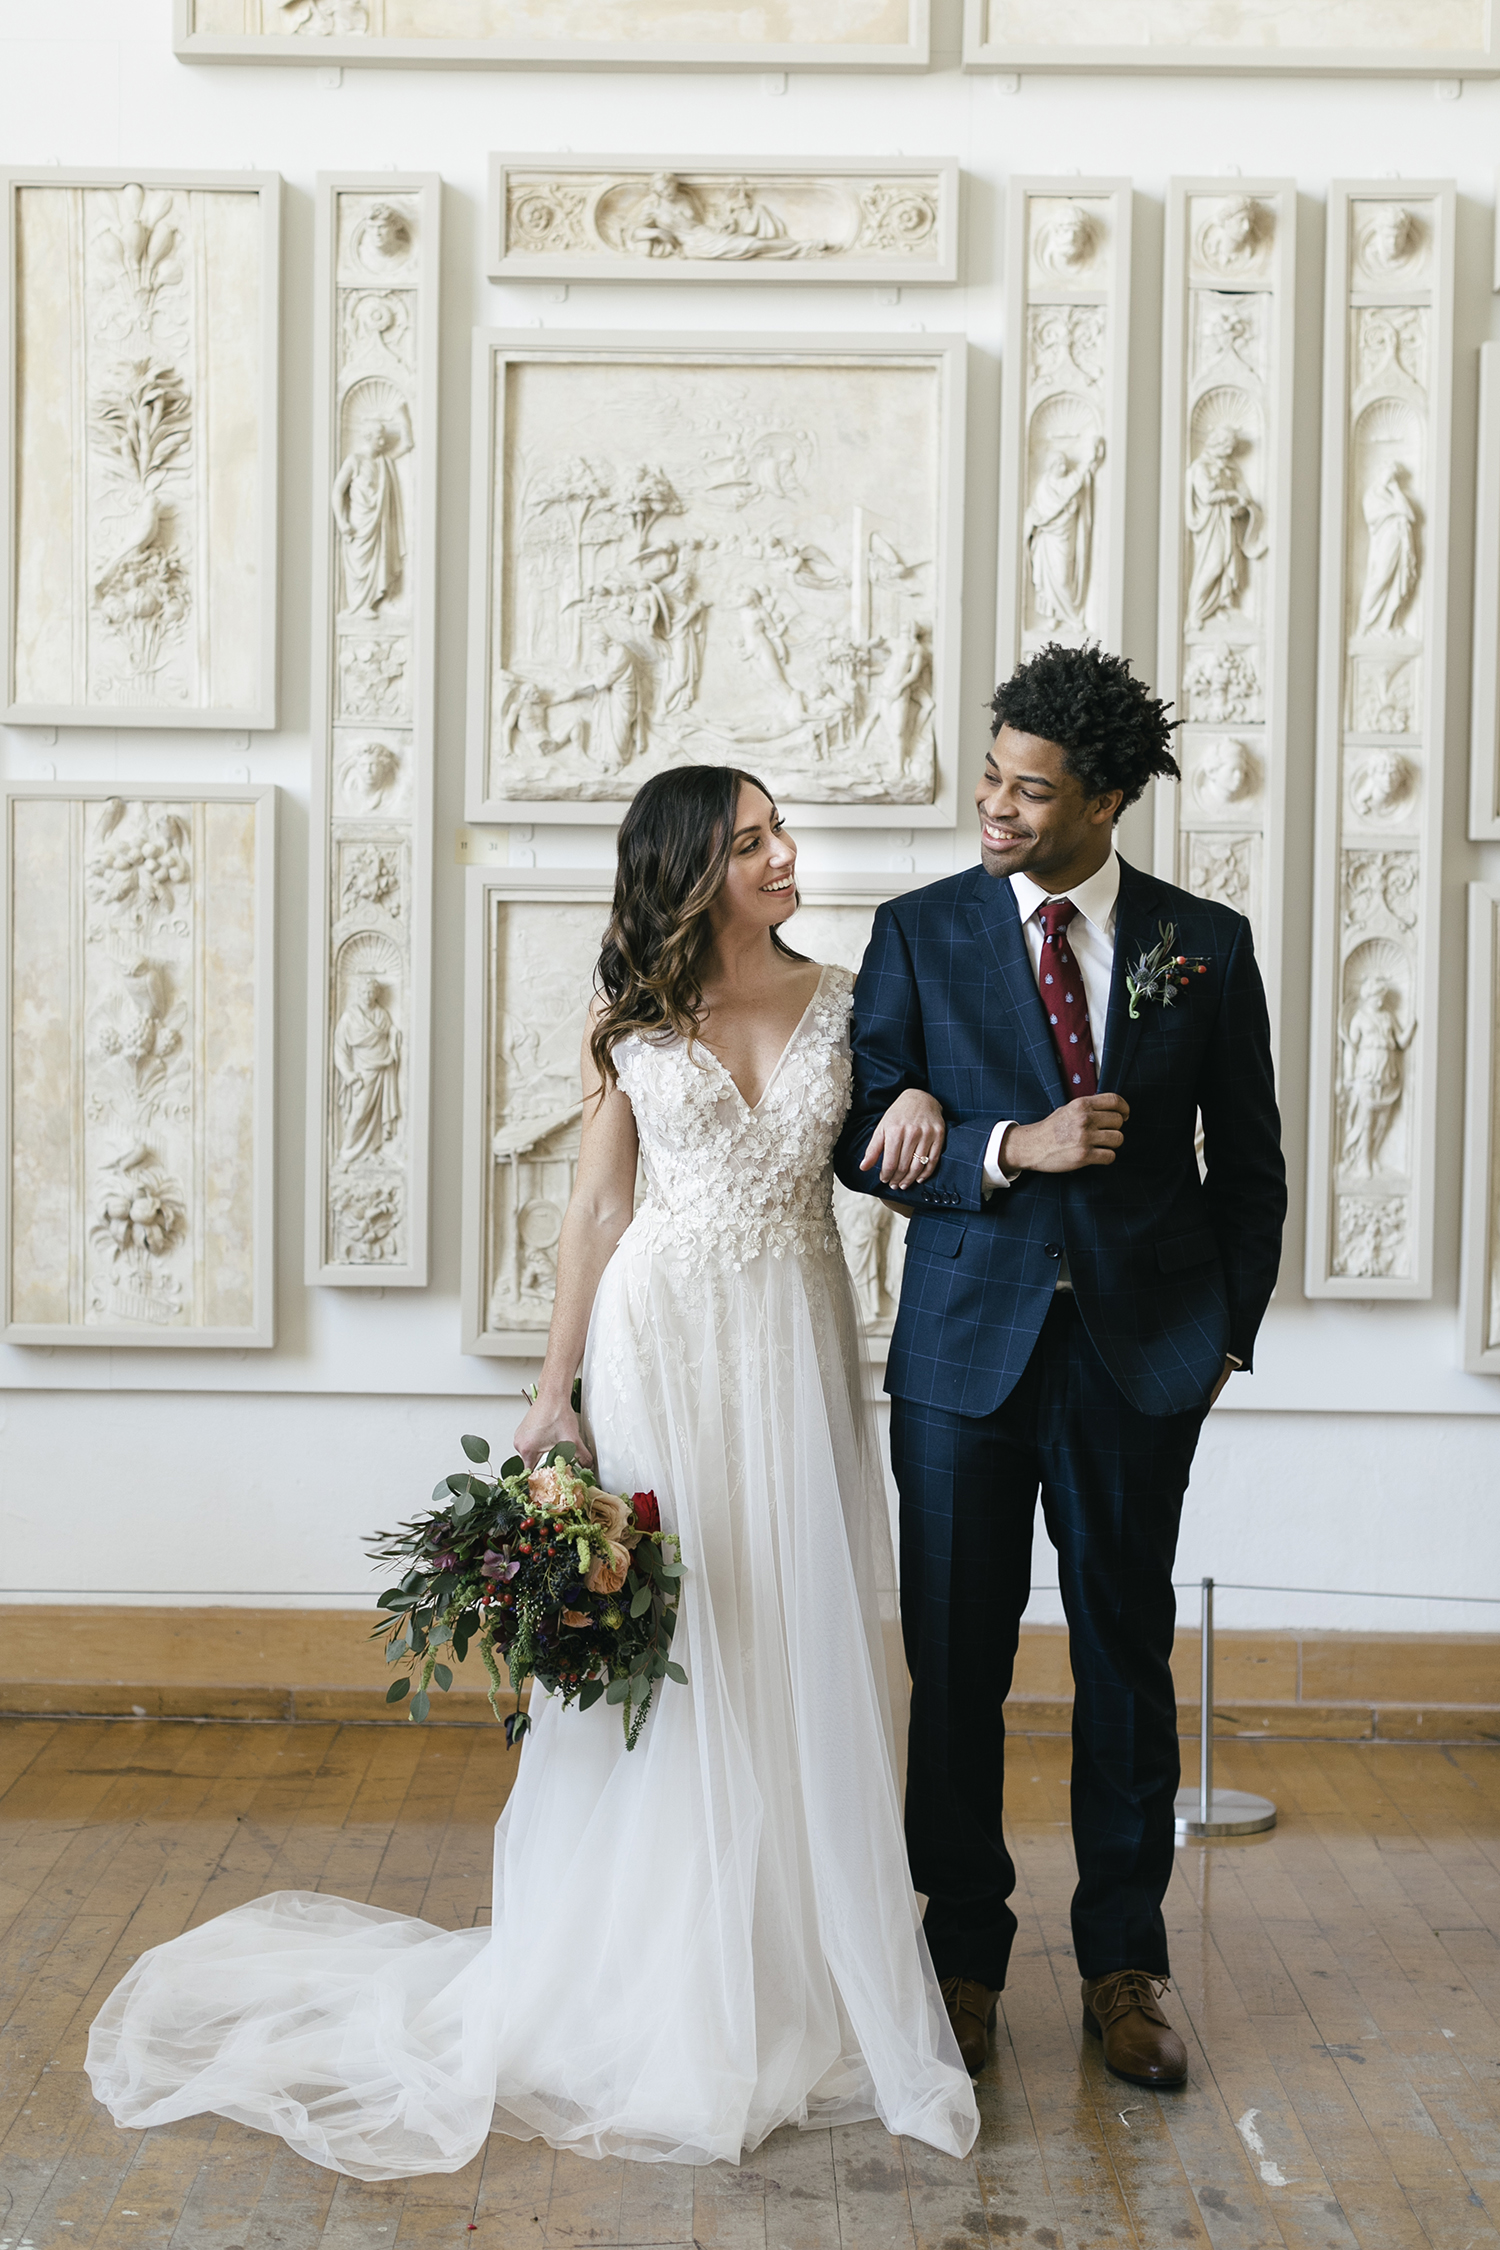 photography-wedding-weddings-natural-candid-pafa-pennsylvania academy-philadephia-philly-philadelphia wedding-mixed race-editorial-modern-fine-art-045.JPG